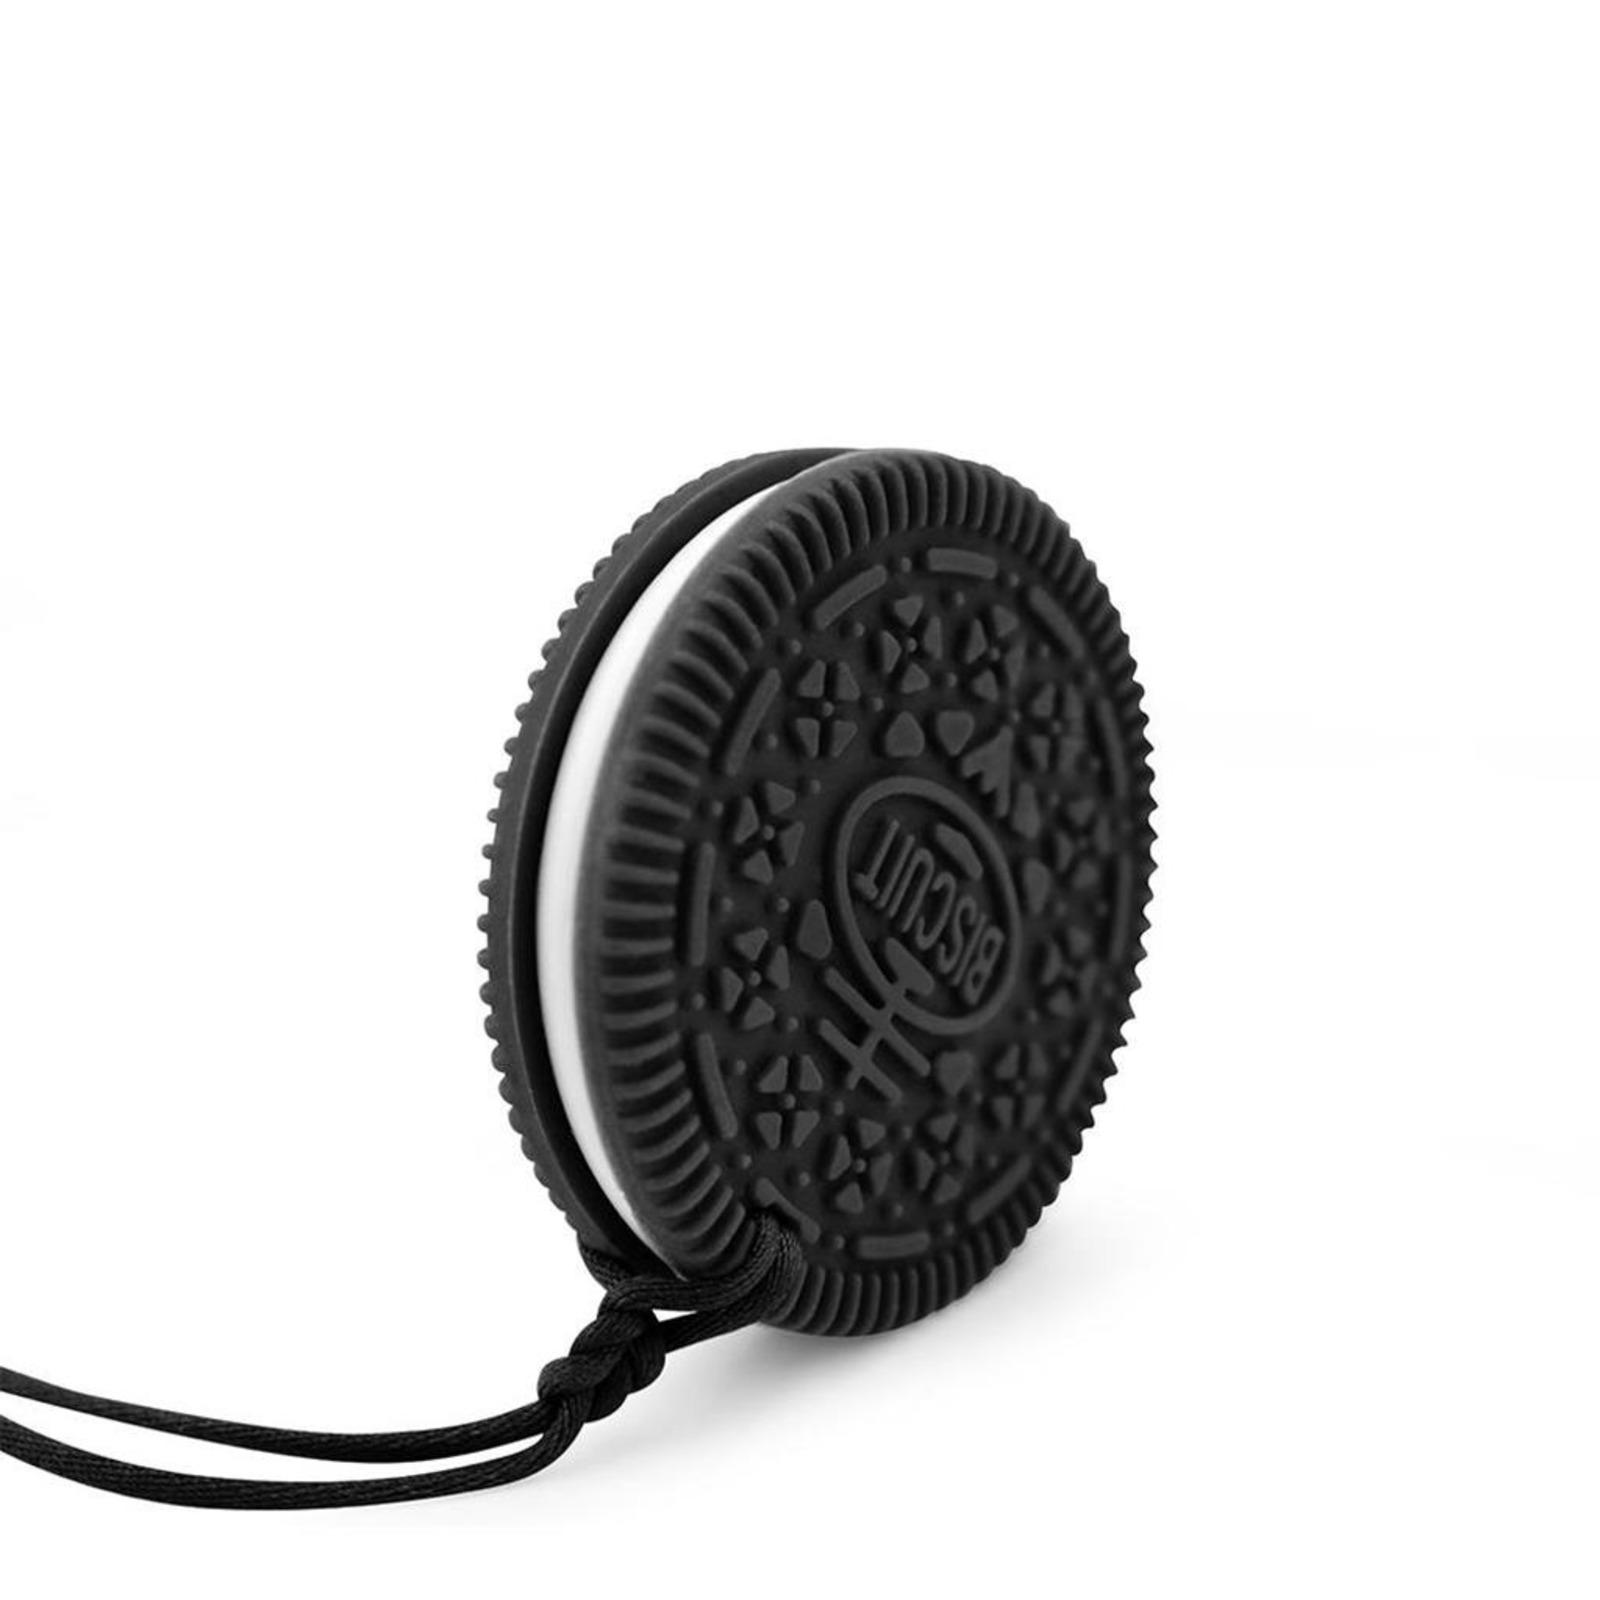 Haakaa Silicone Teether - Cookie